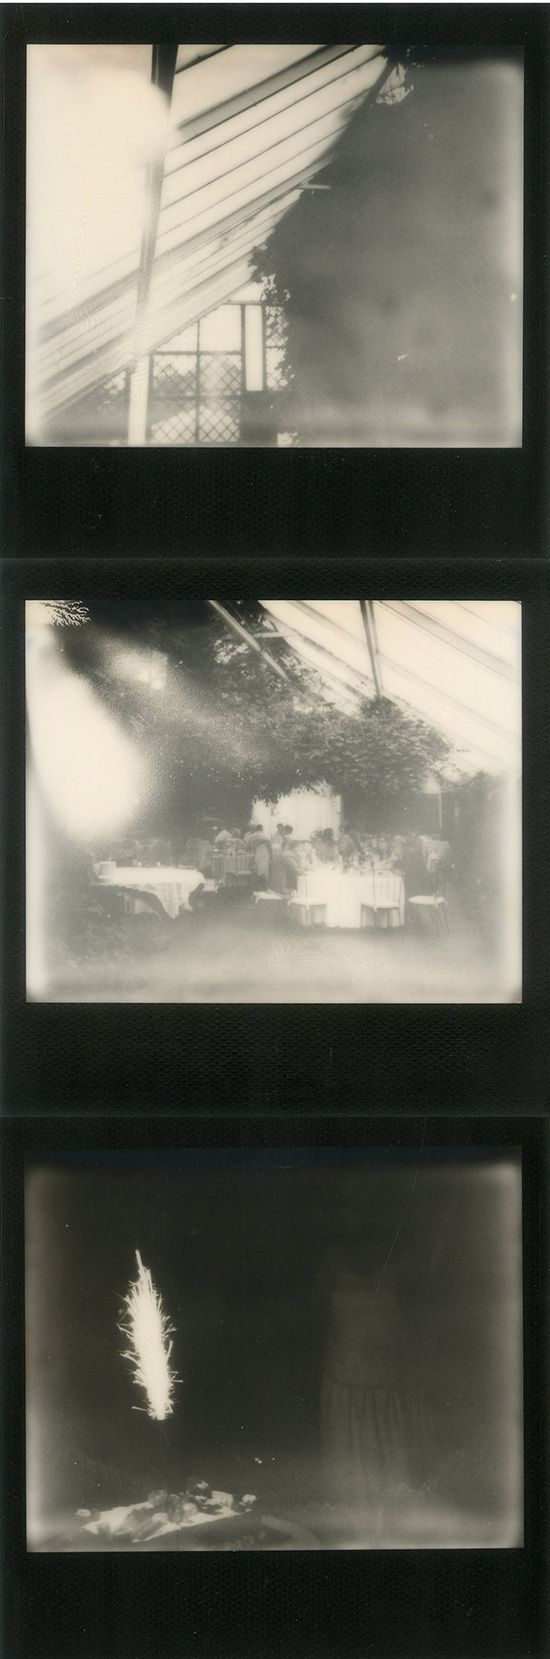 Greenhouse wedding captured on Impossible Project film #polaroid #zukistudio #impossibleproject #instantphotography #black #frame